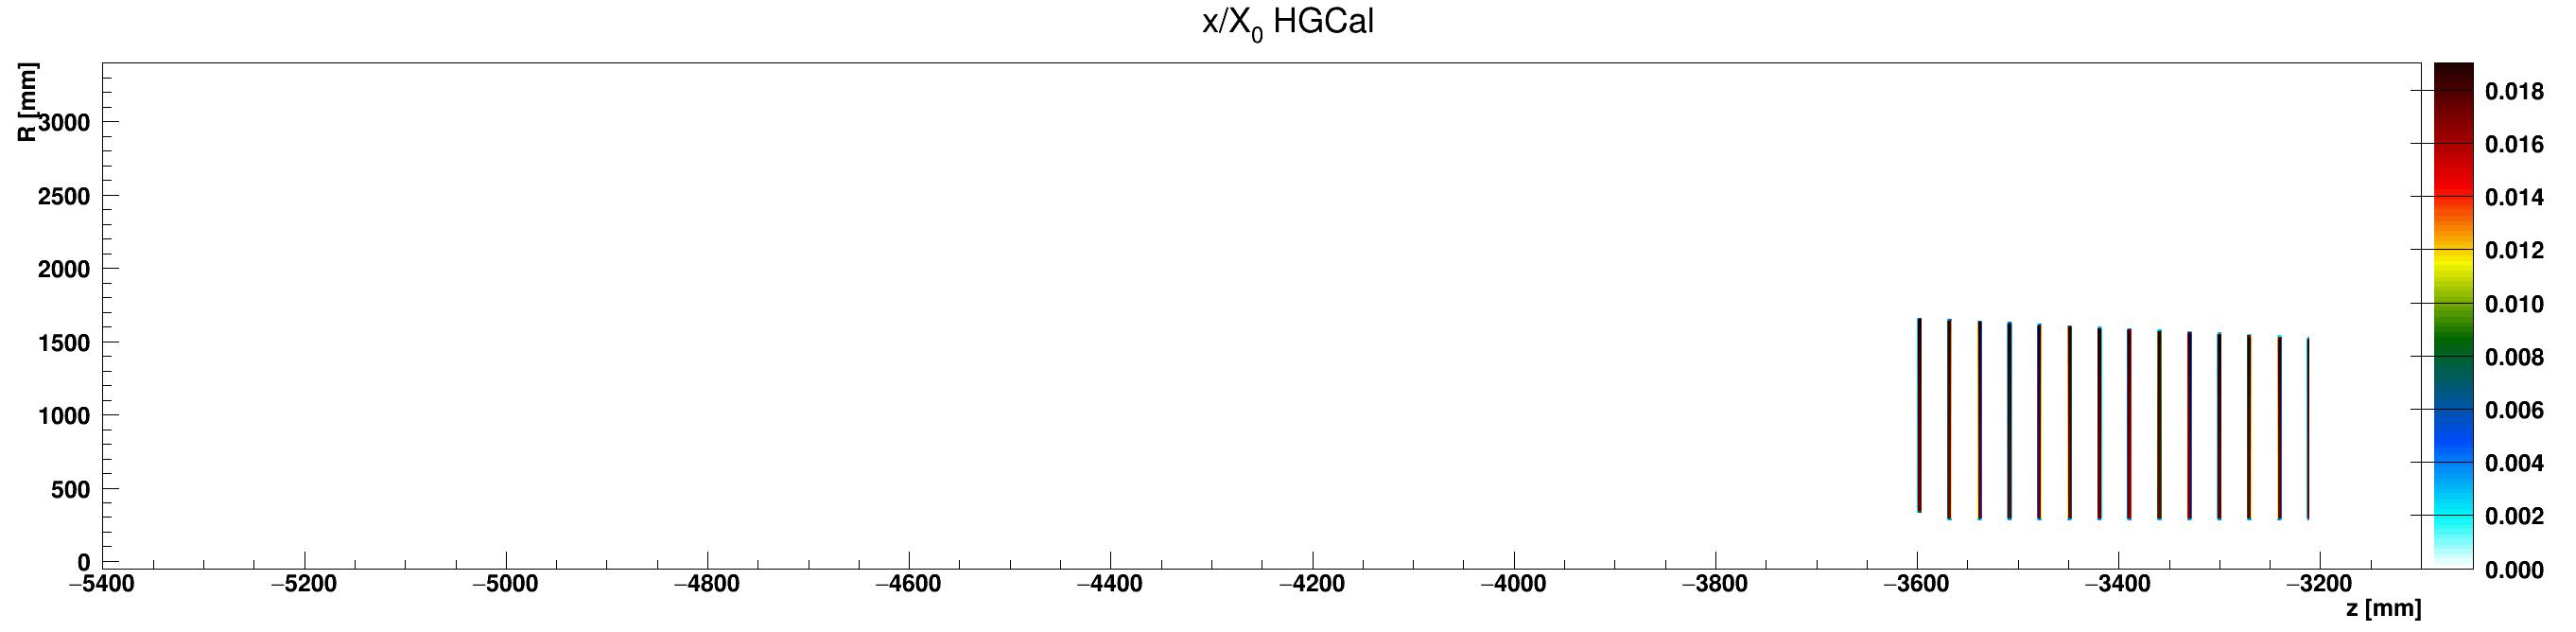 HGCal_x_vs_z_vs_RlocLead_ZminusZoom.png